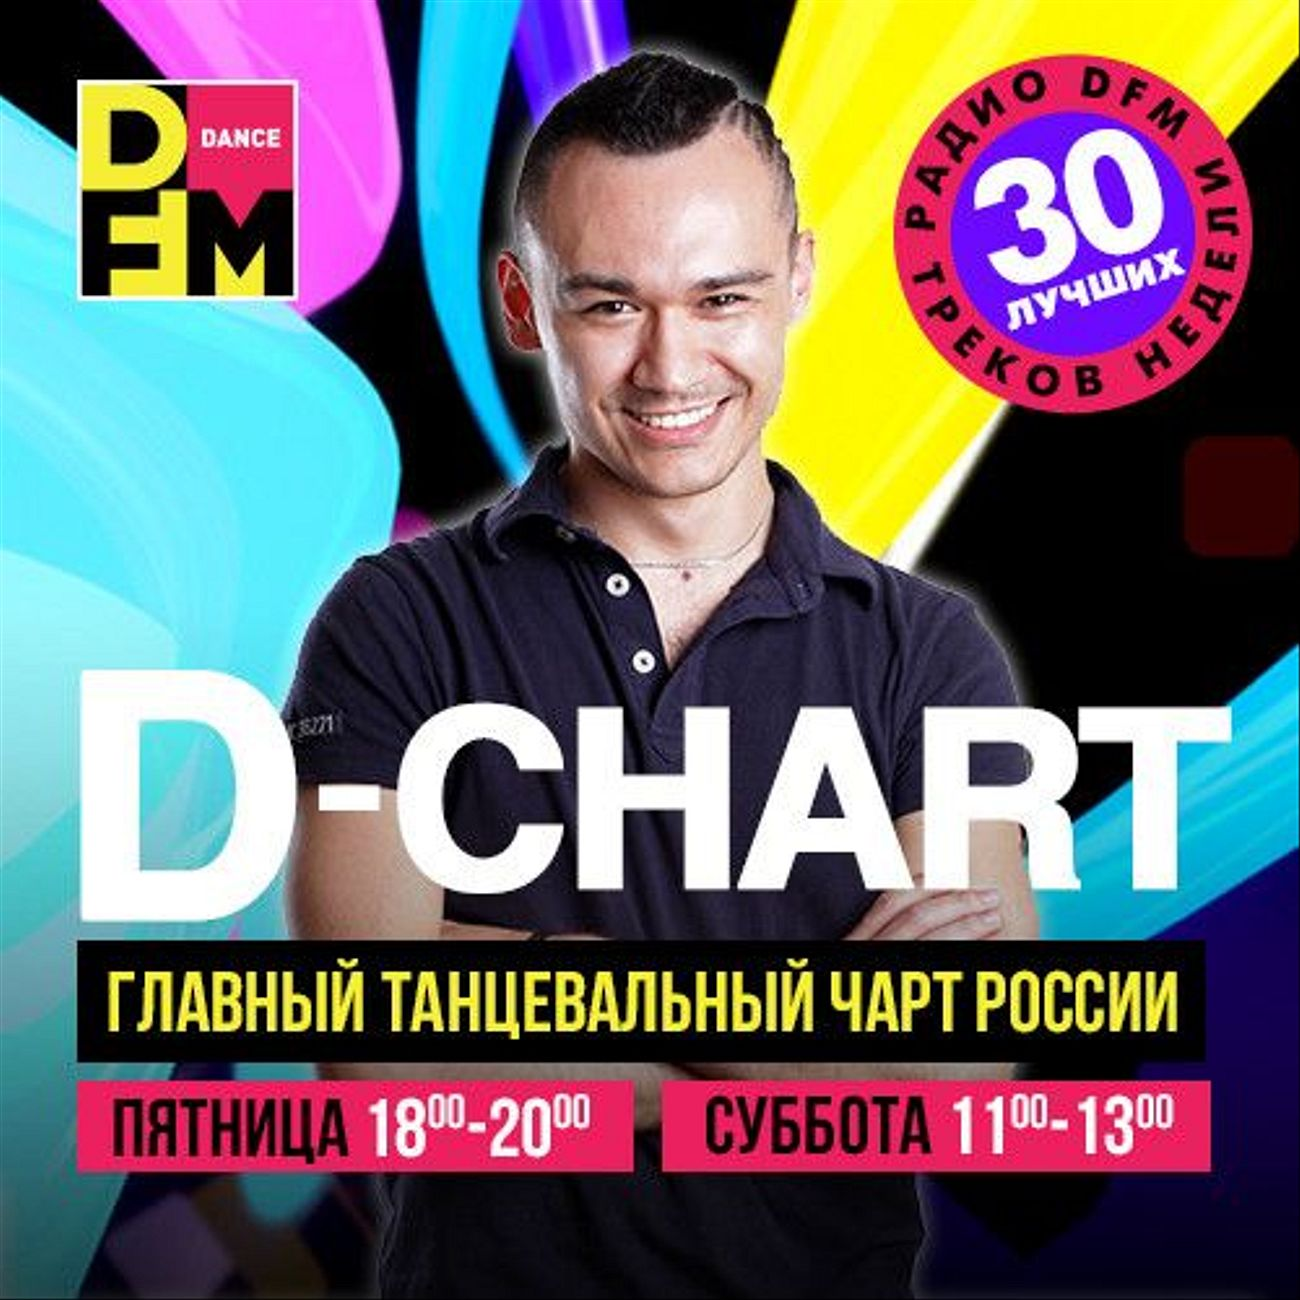 DFM D-CHART